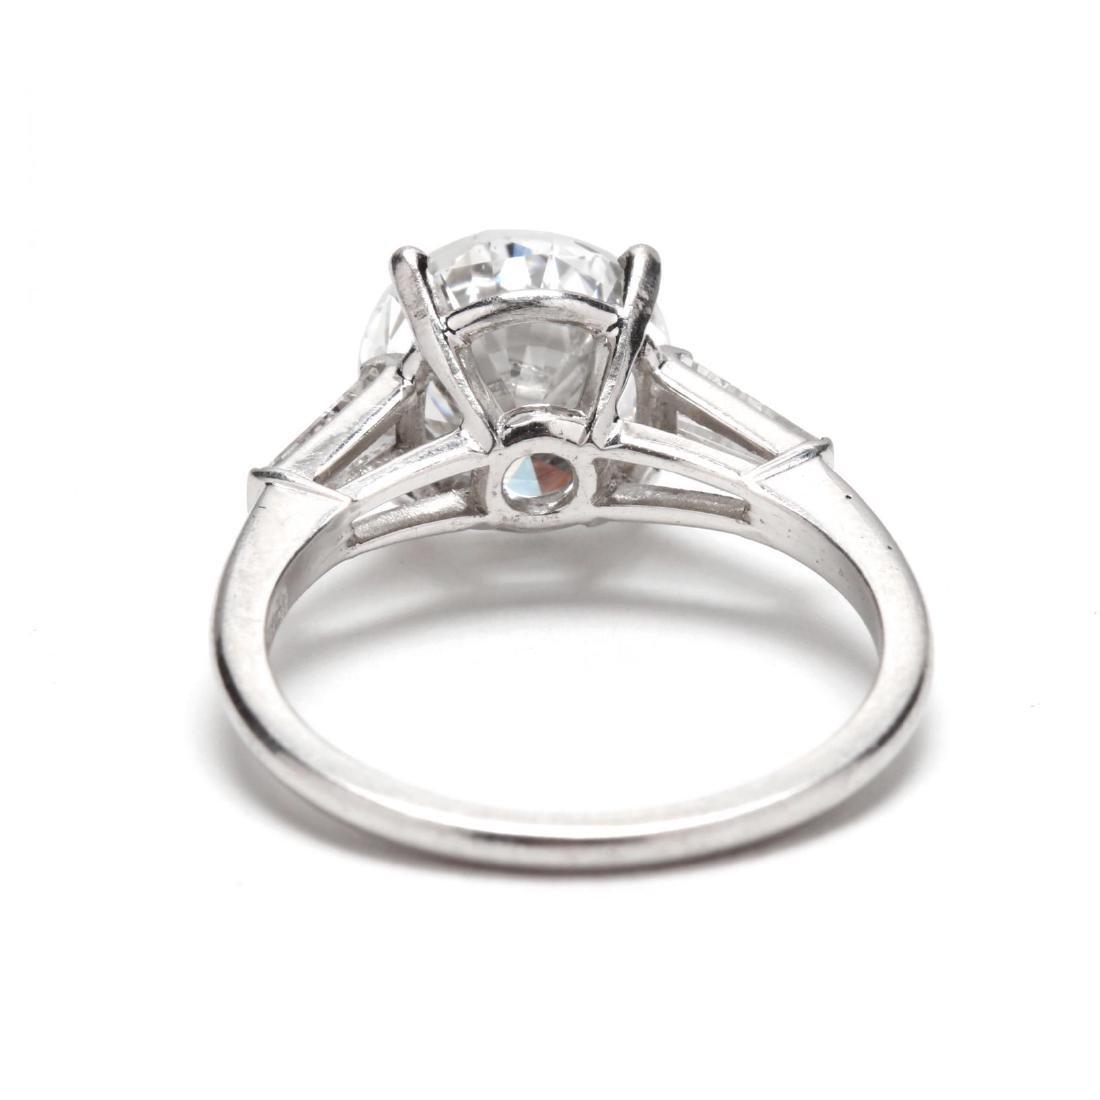 Unmounted Round Brilliant Cut Diamond with Platinum and - 6